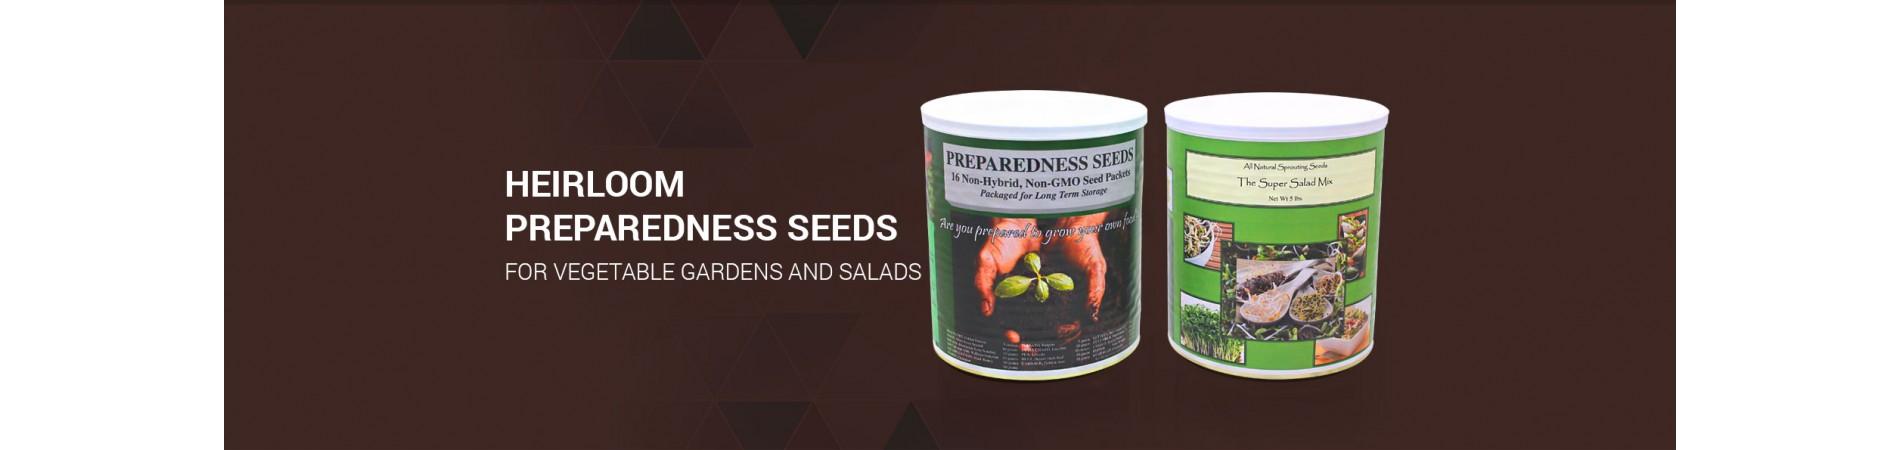 Heirloom Preparedness Seeds for Vegetable